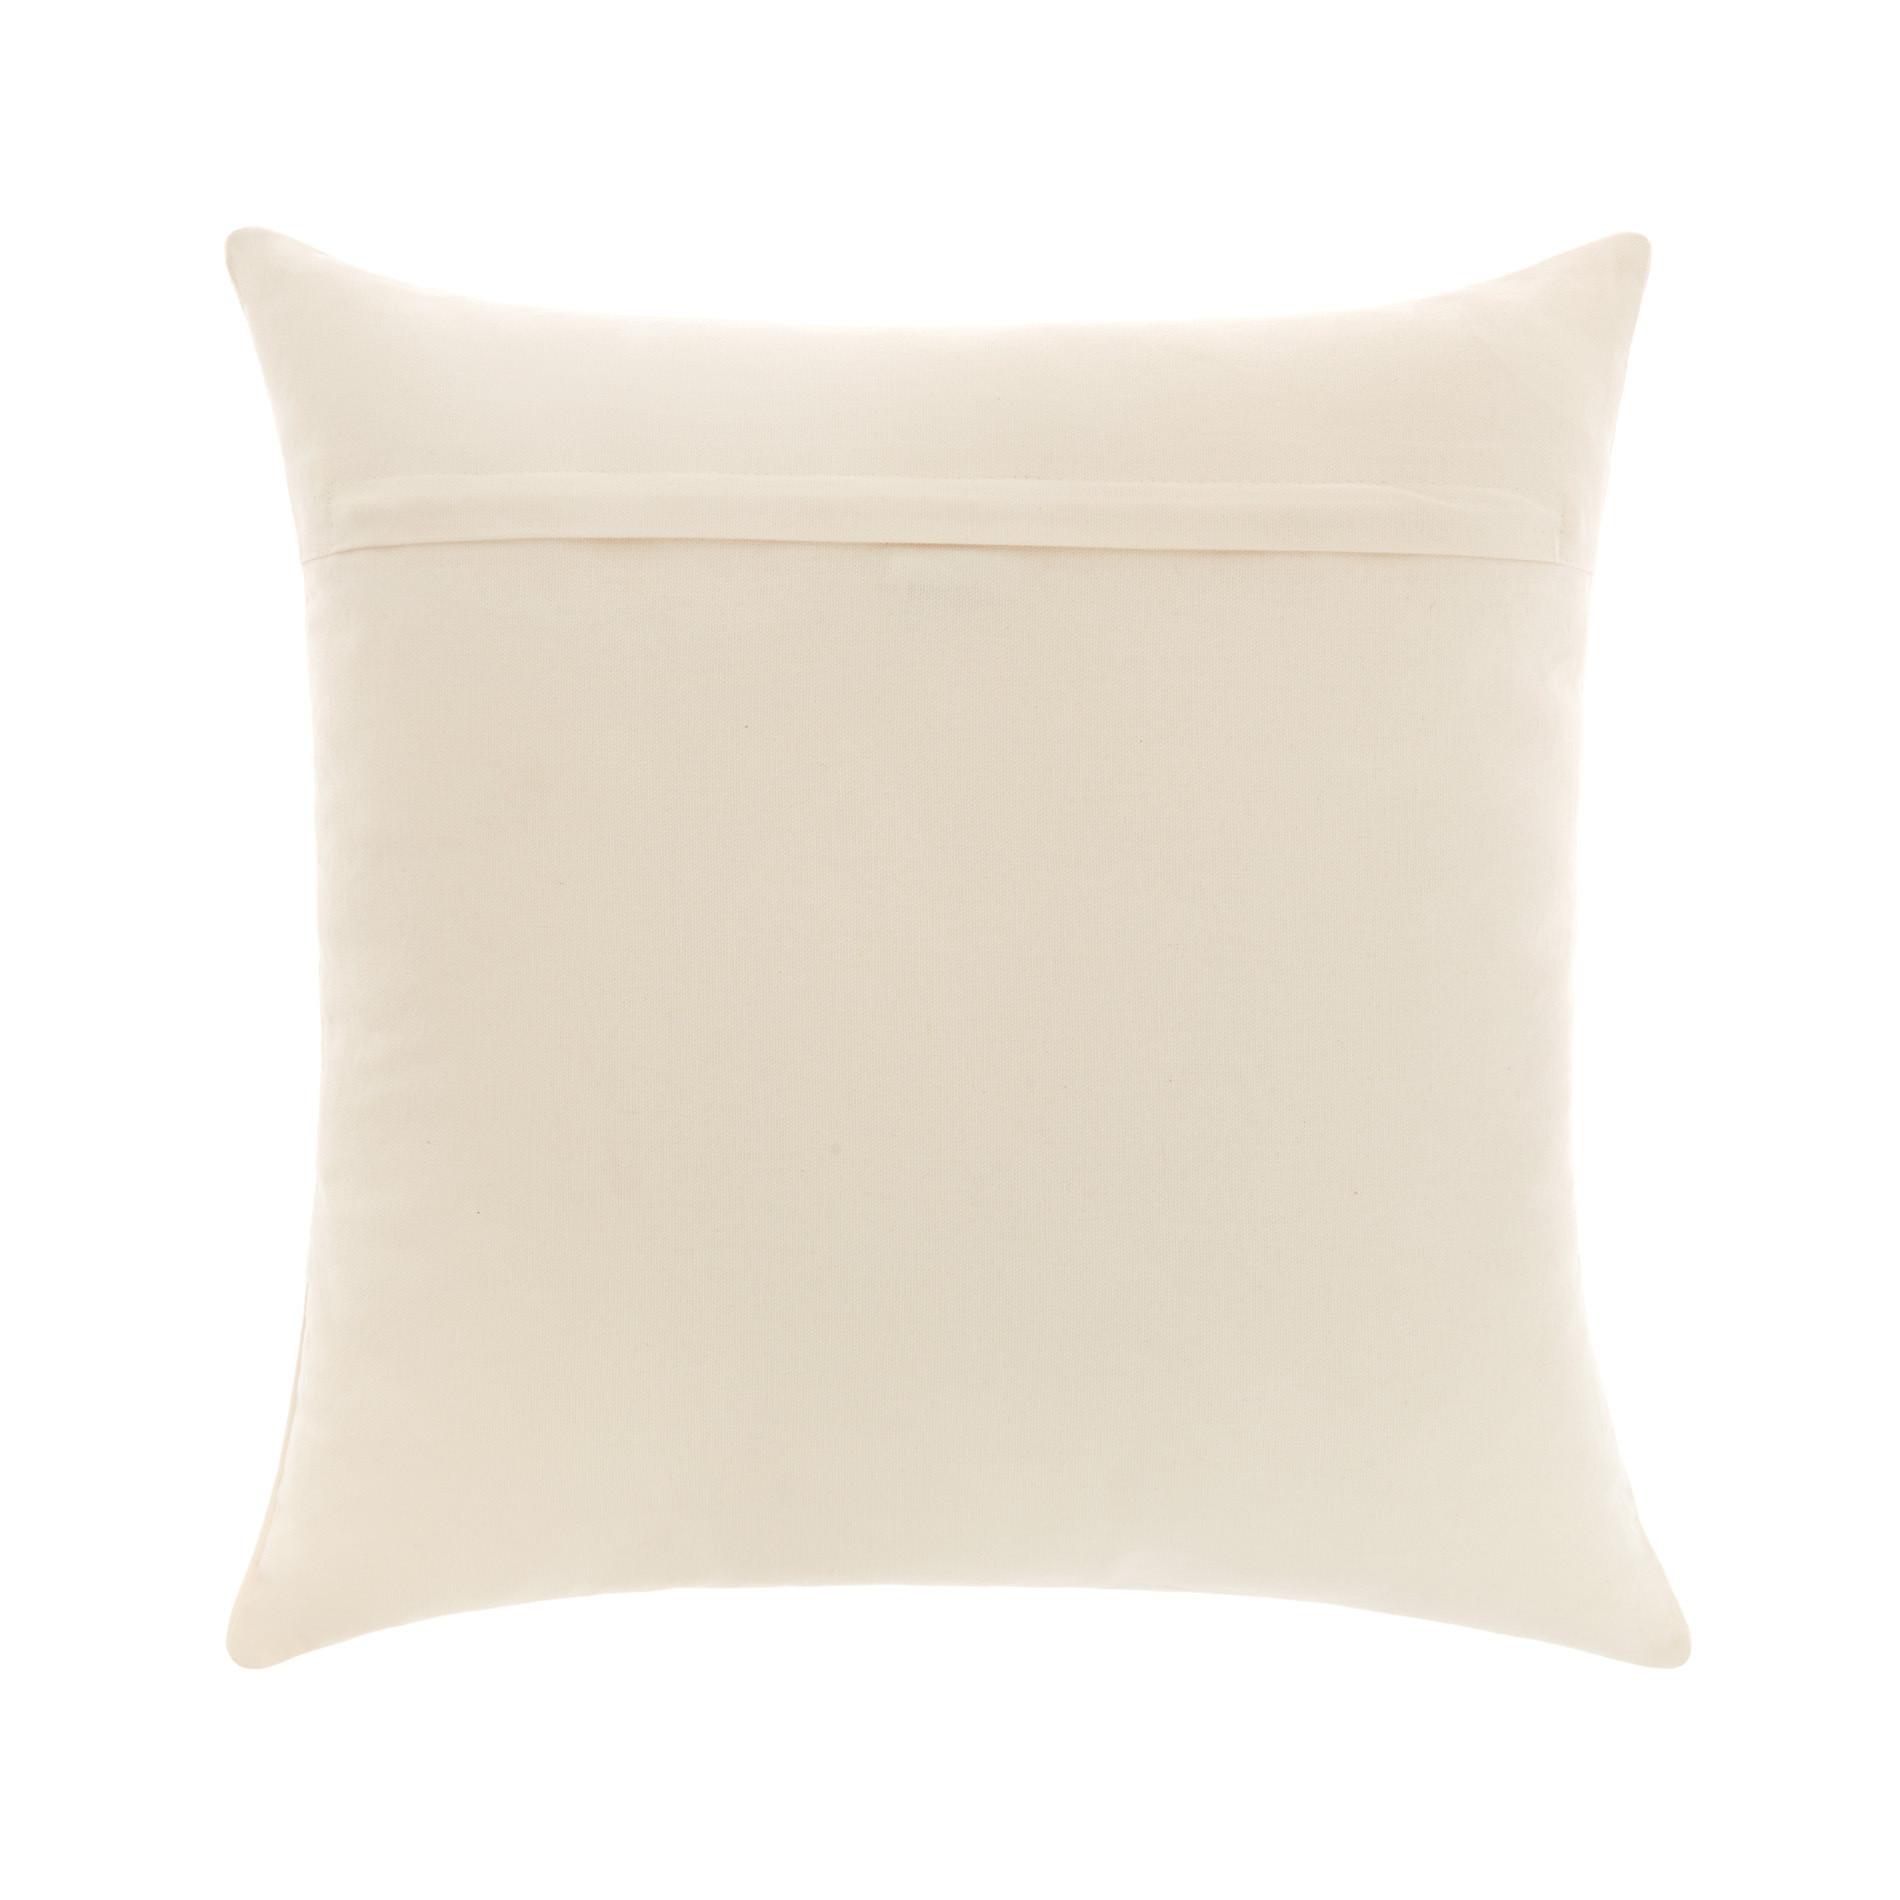 Cuscino ricamo floreale 45x45cm, Bianco, large image number 1